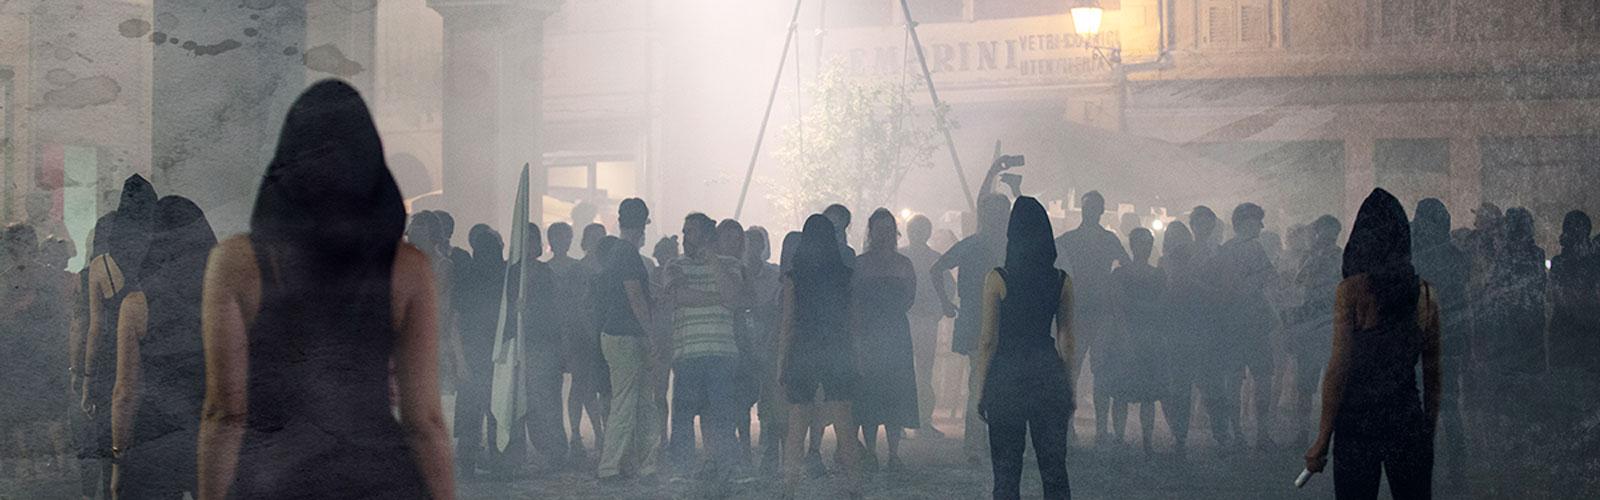 festivals - foto & video diane | ilaria scarpa | luca telleschi